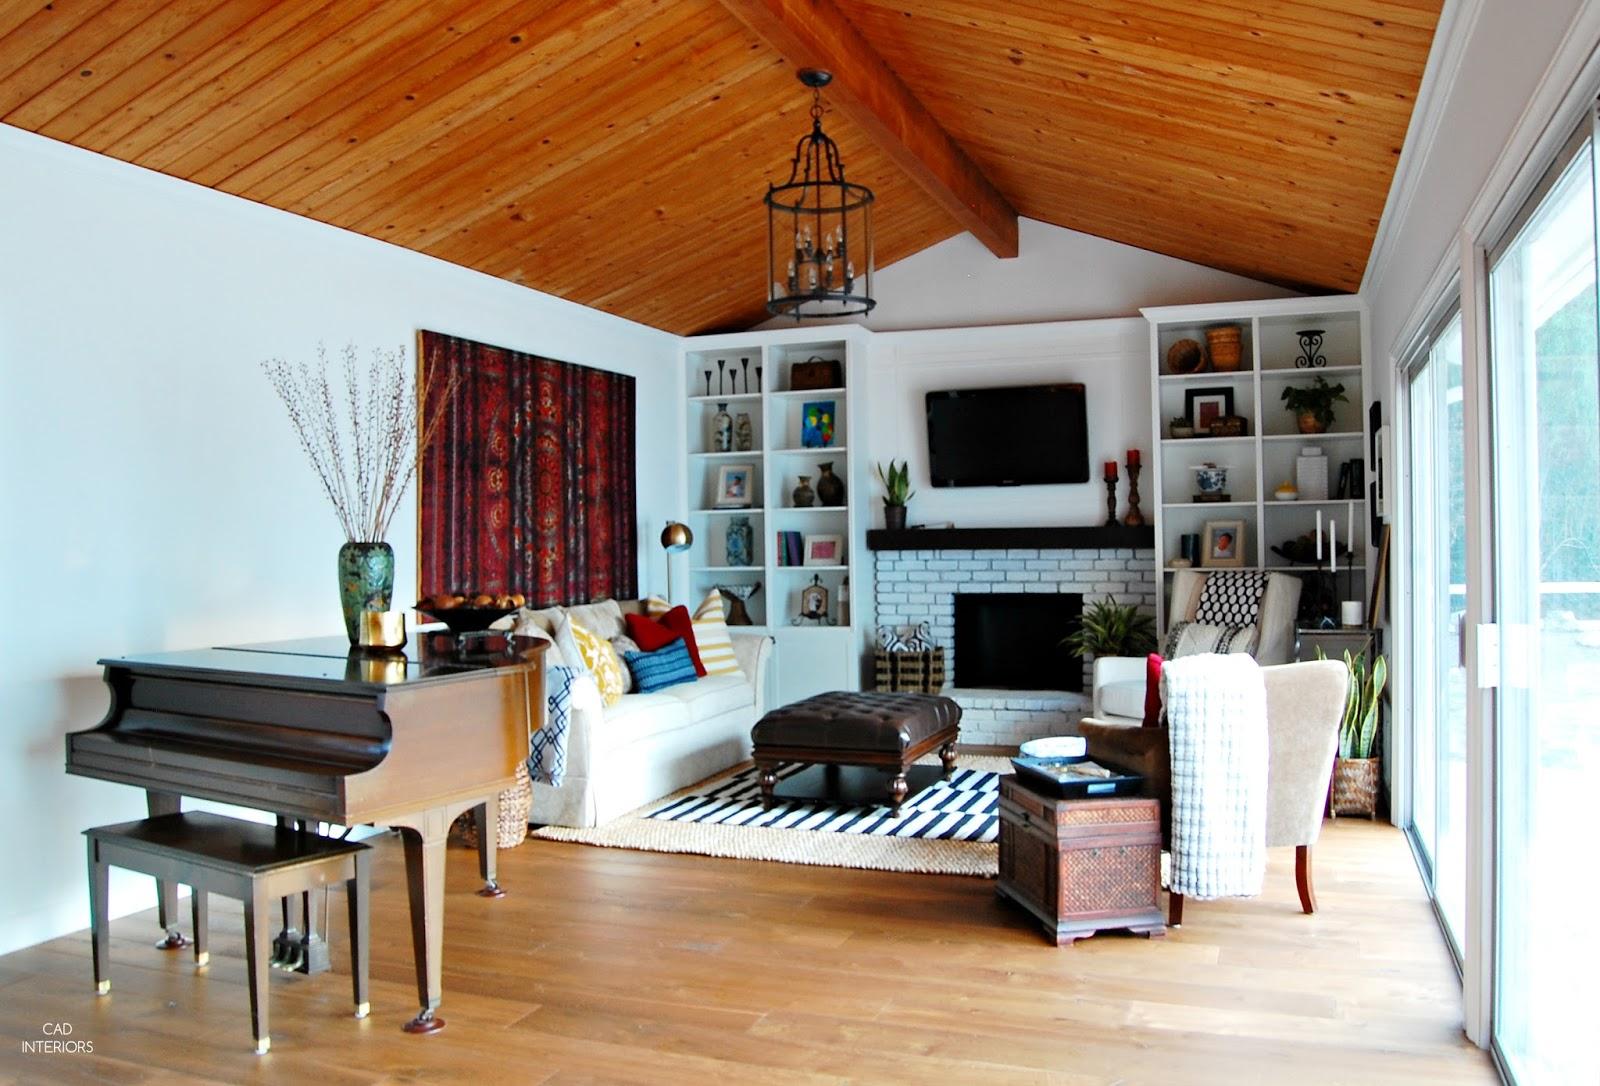 modern bohemian eclectic transitional vintage mid-century interior design budget design decorating home improvement DIY